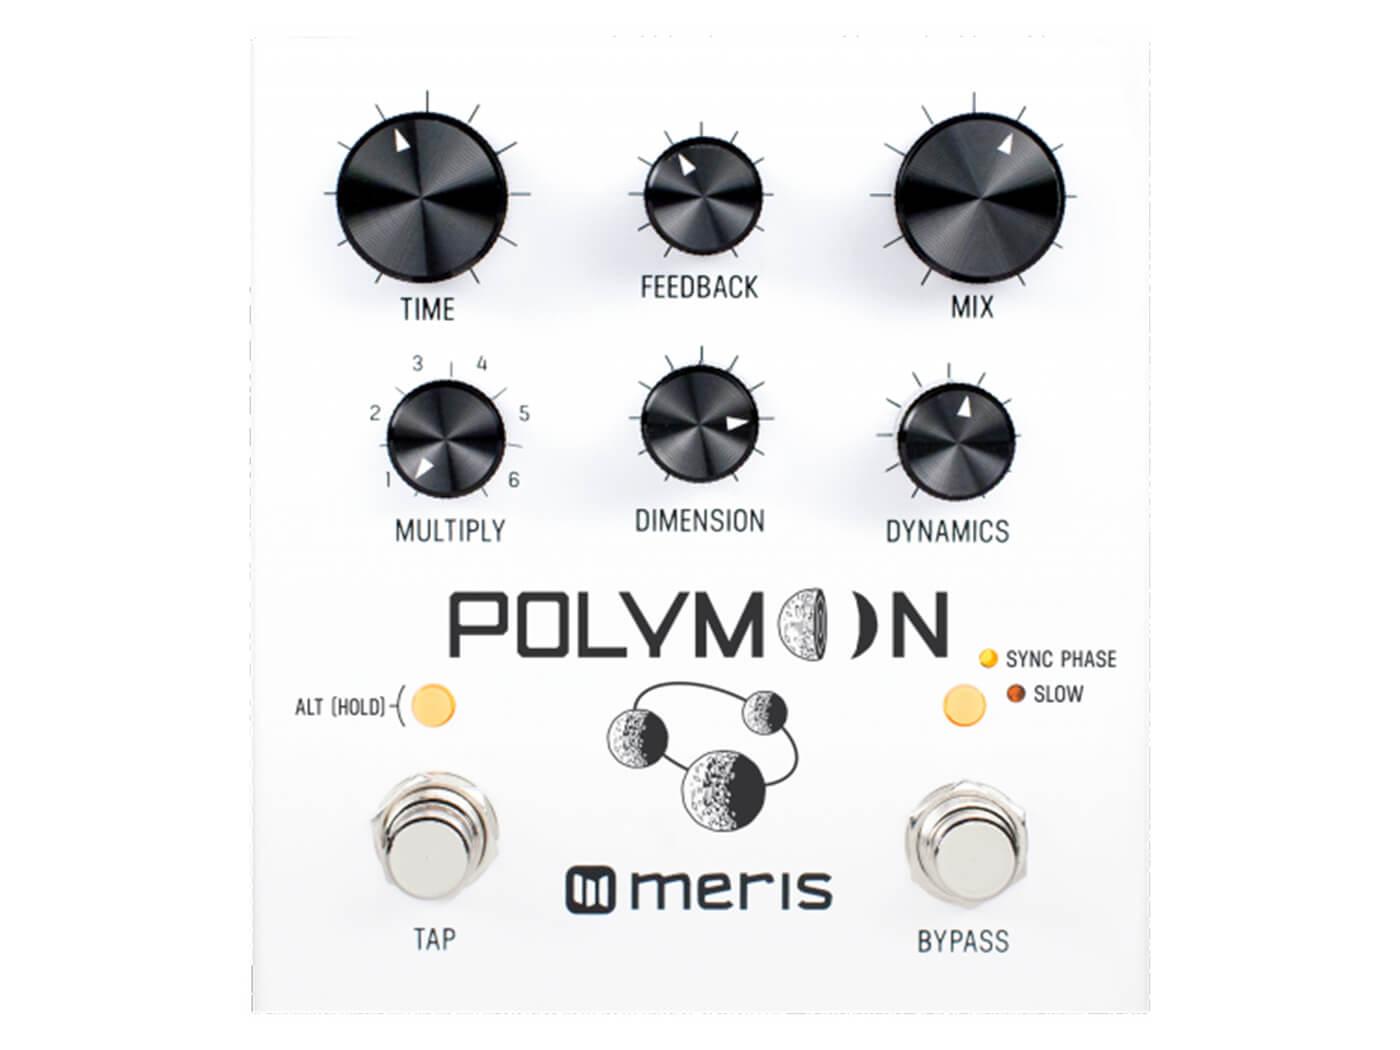 The Meris Polymoon